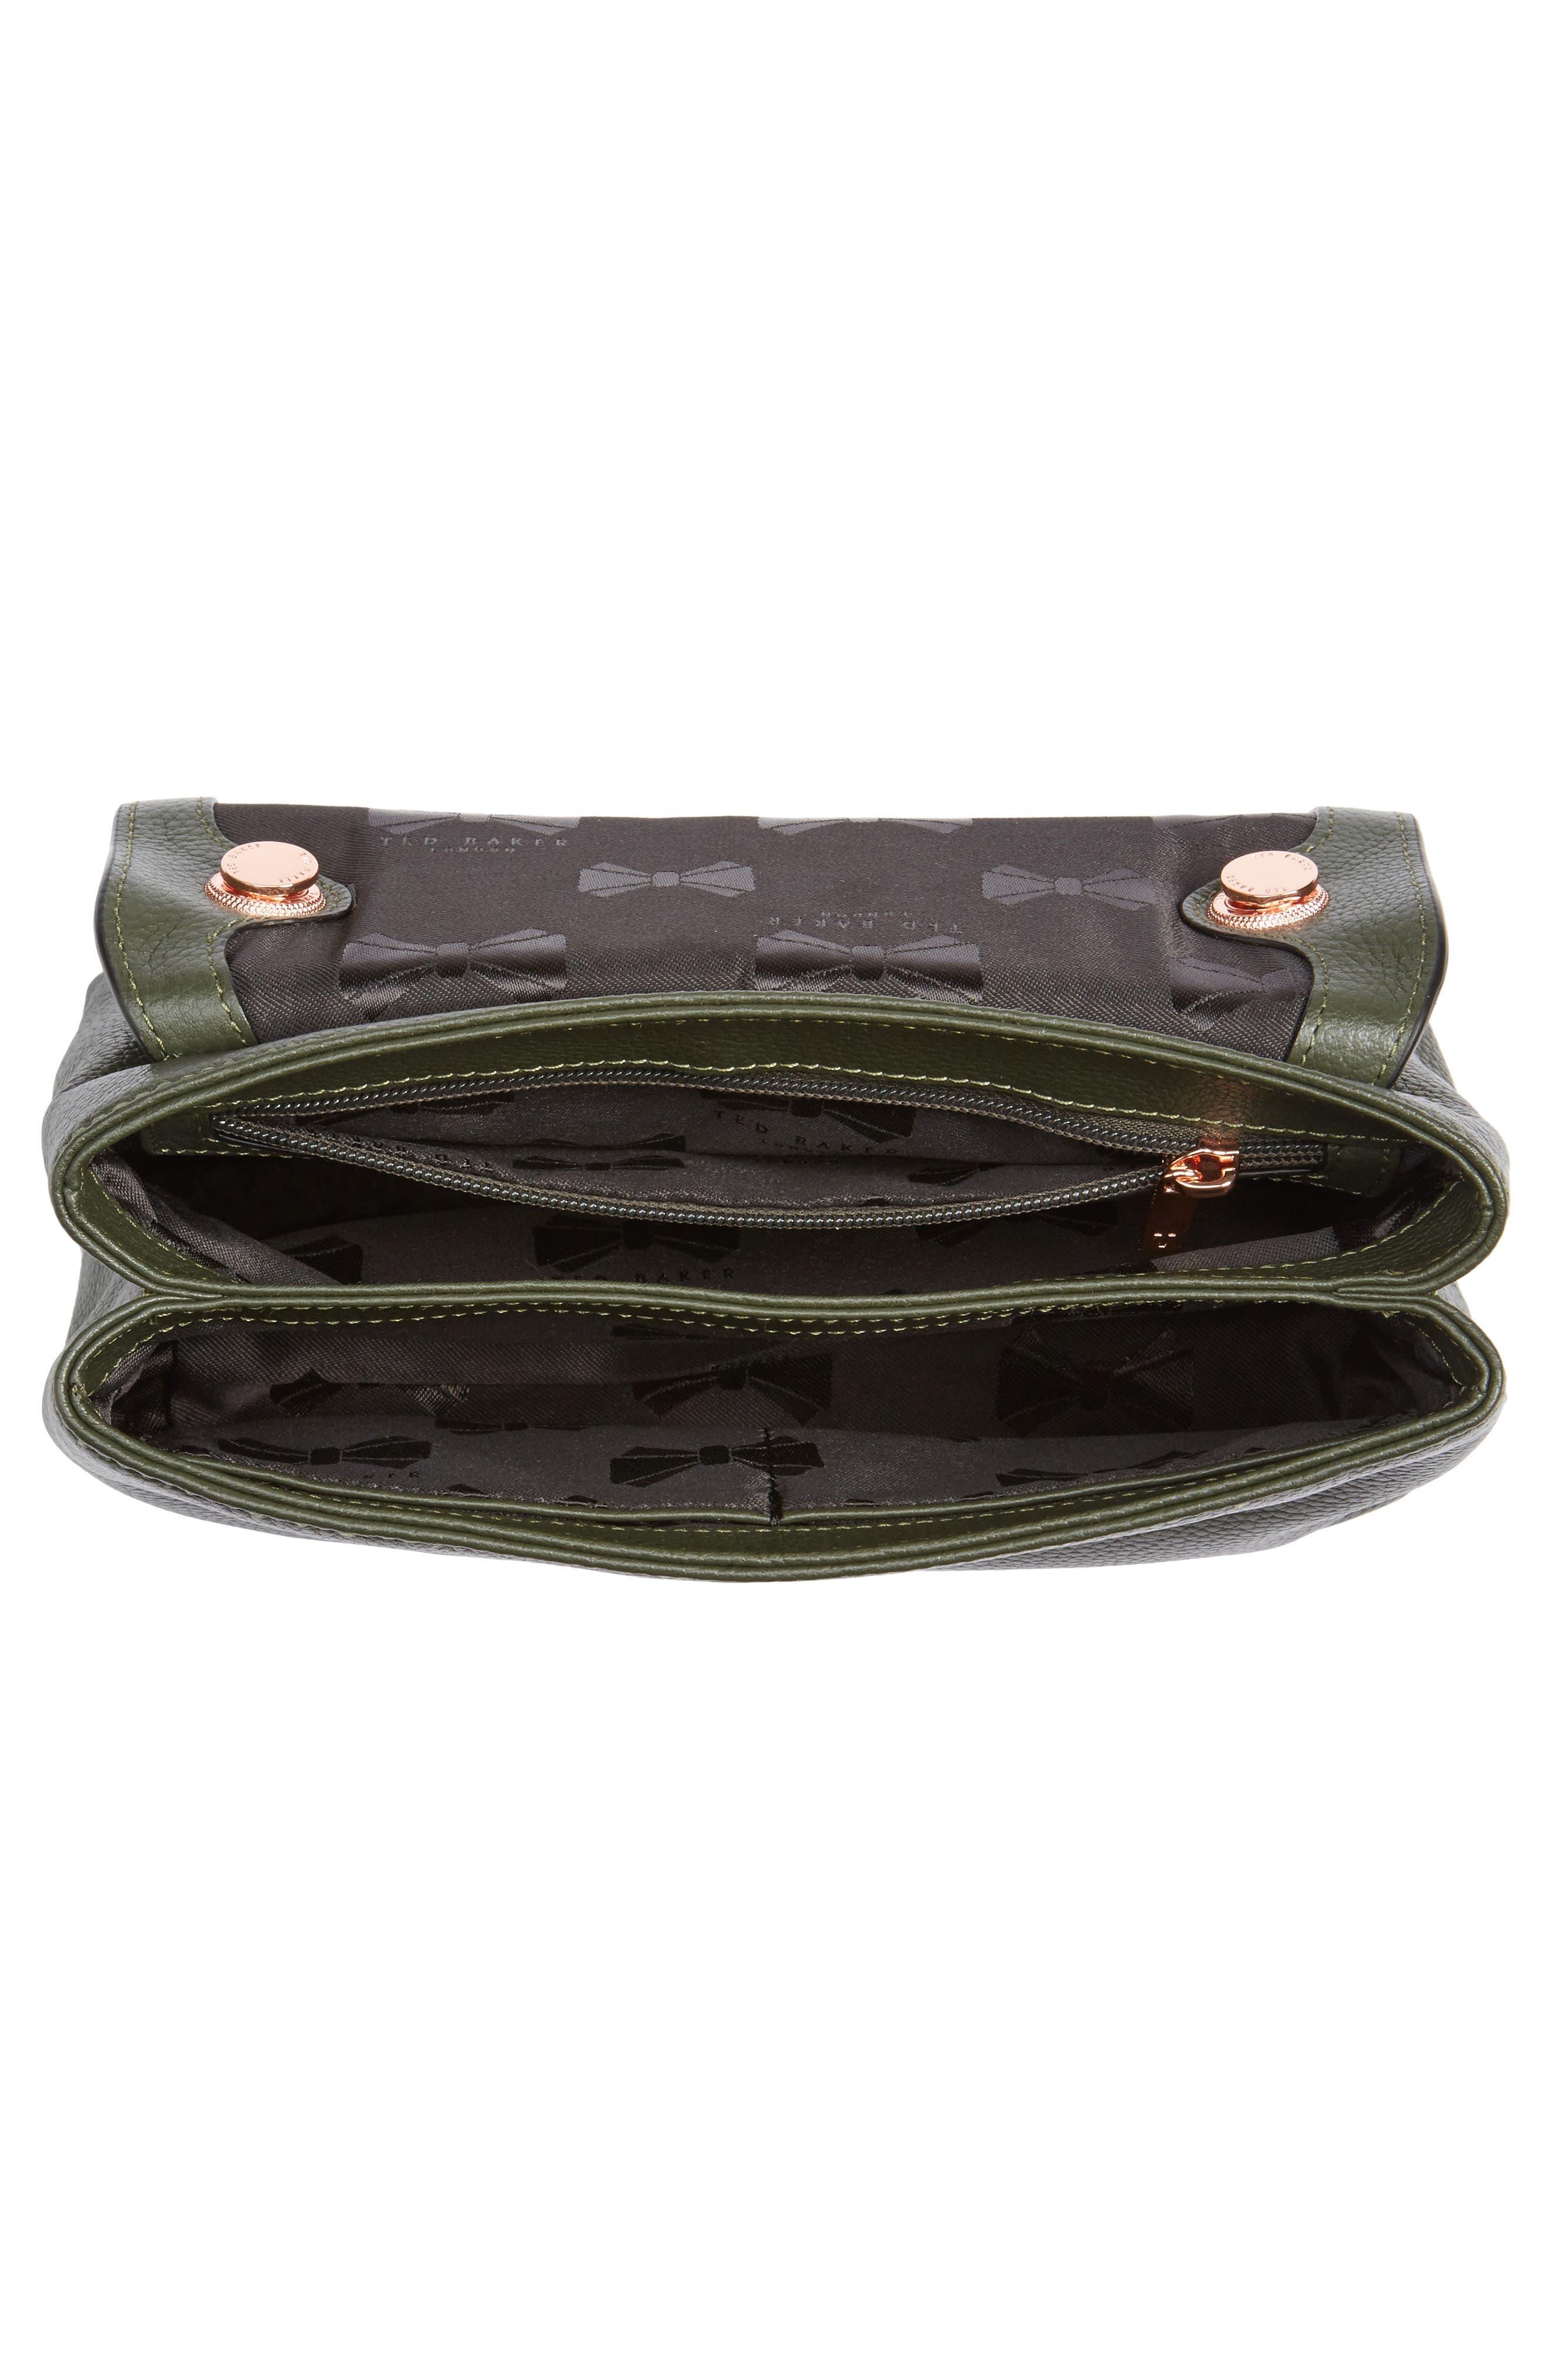 Sorikai Leather & Suede Crossbody Bag,                             Alternate thumbnail 3, color,                             Khaki